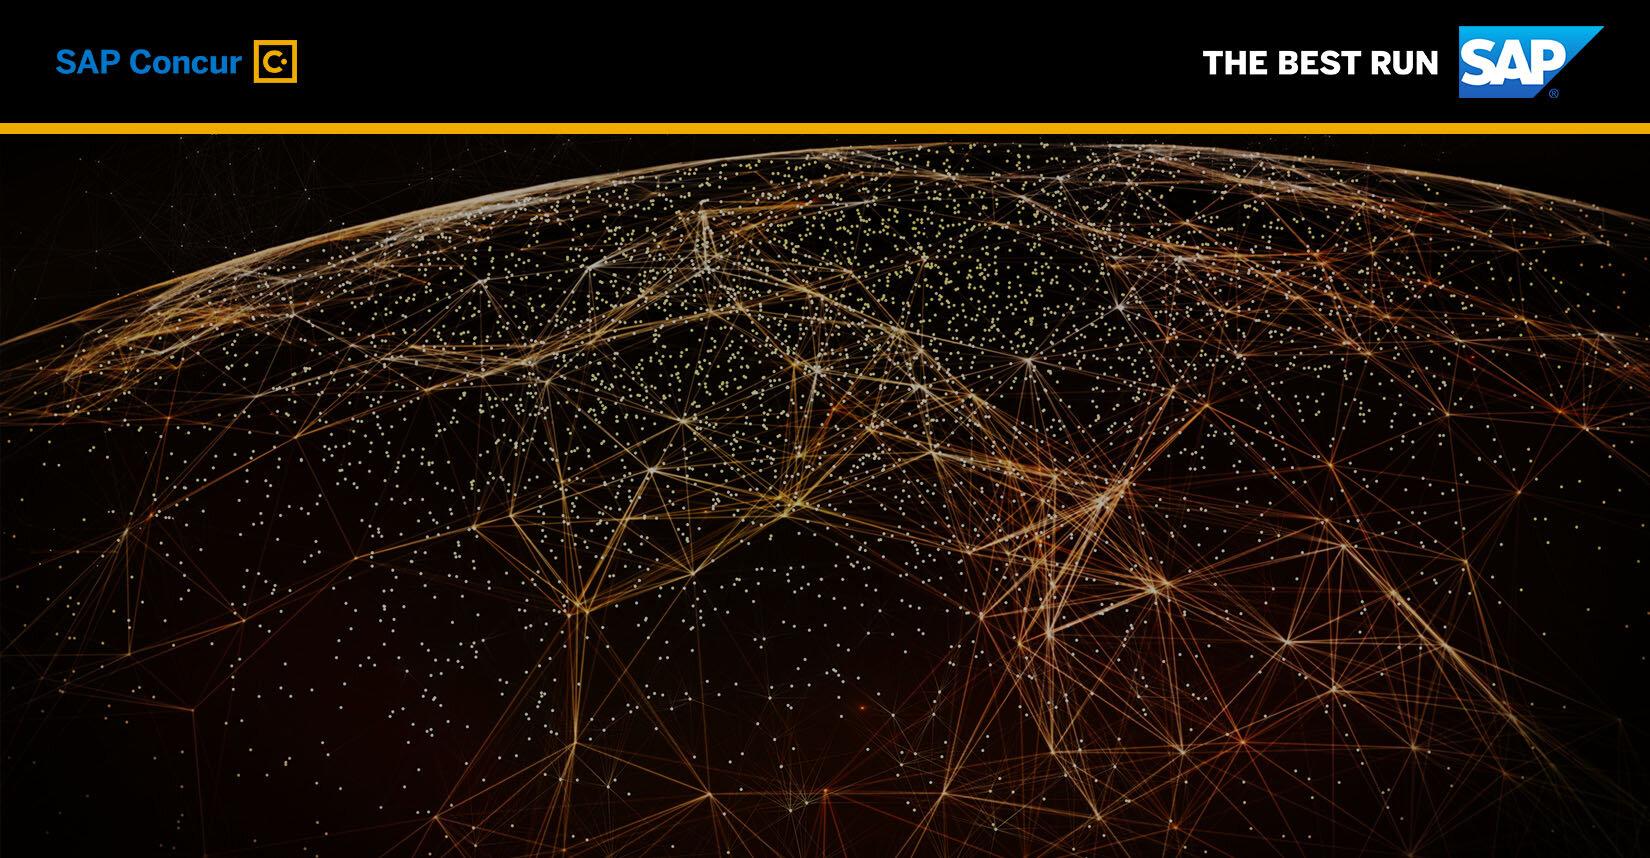 SAP_Concur_ON24_WebinarConsole_BG_11.jpg